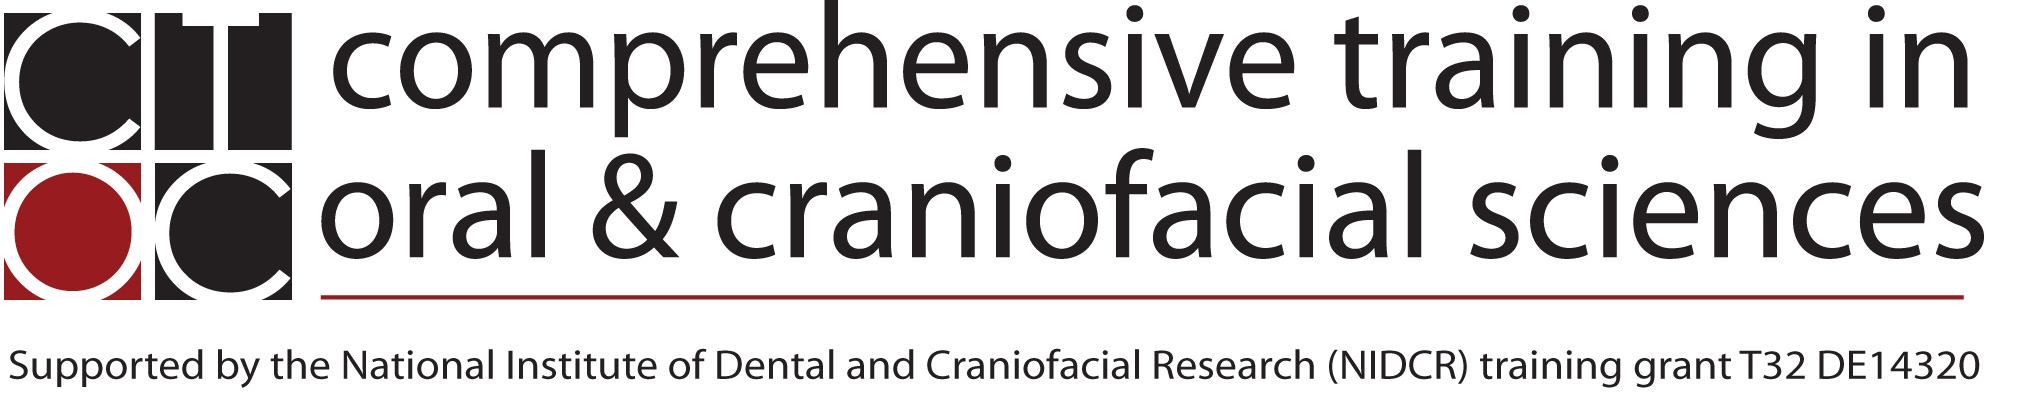 Comprehensive Training in Oral and Craniofacial Sciences